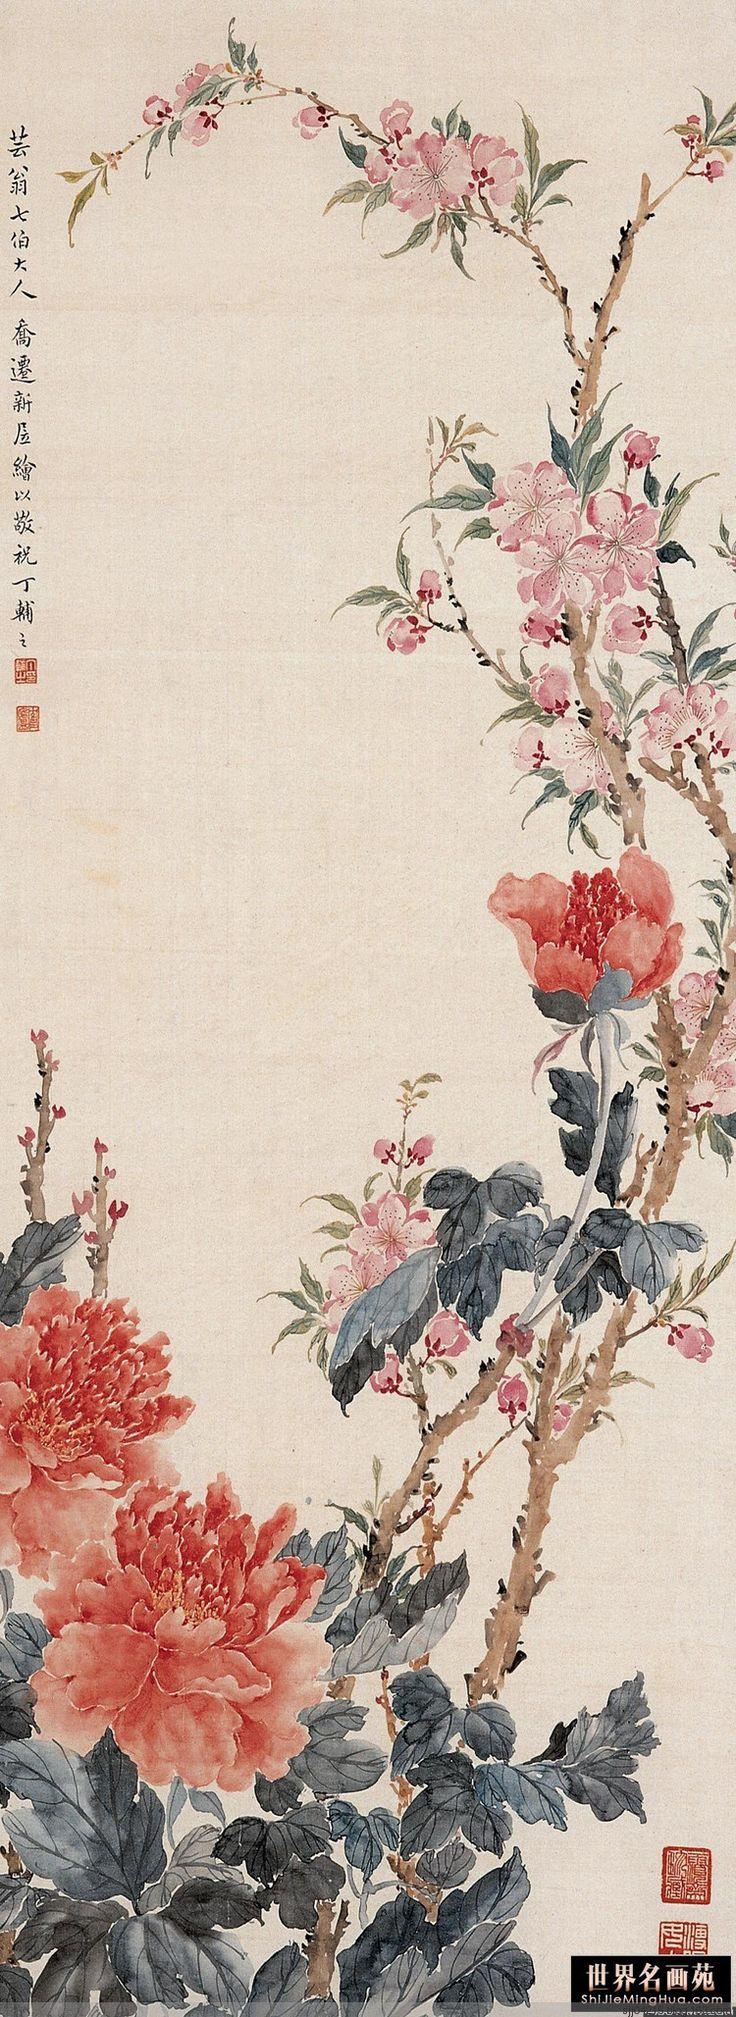 2137 best Chinese& Japanese Art images on Pinterest ...